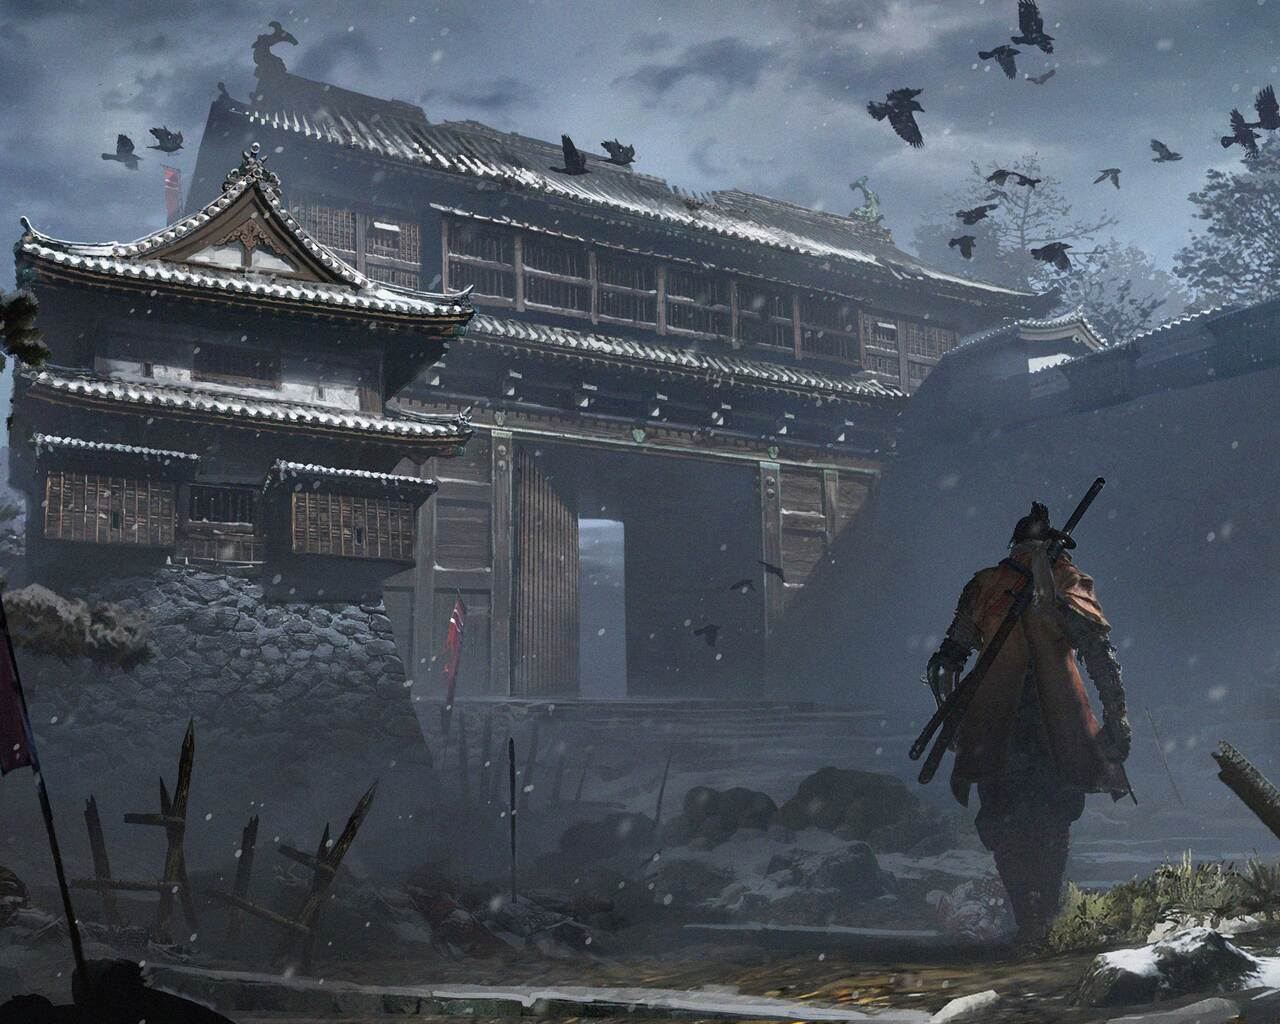 sekiro-shadows-die-twice-game-official-artwork-5k-7p.jpg